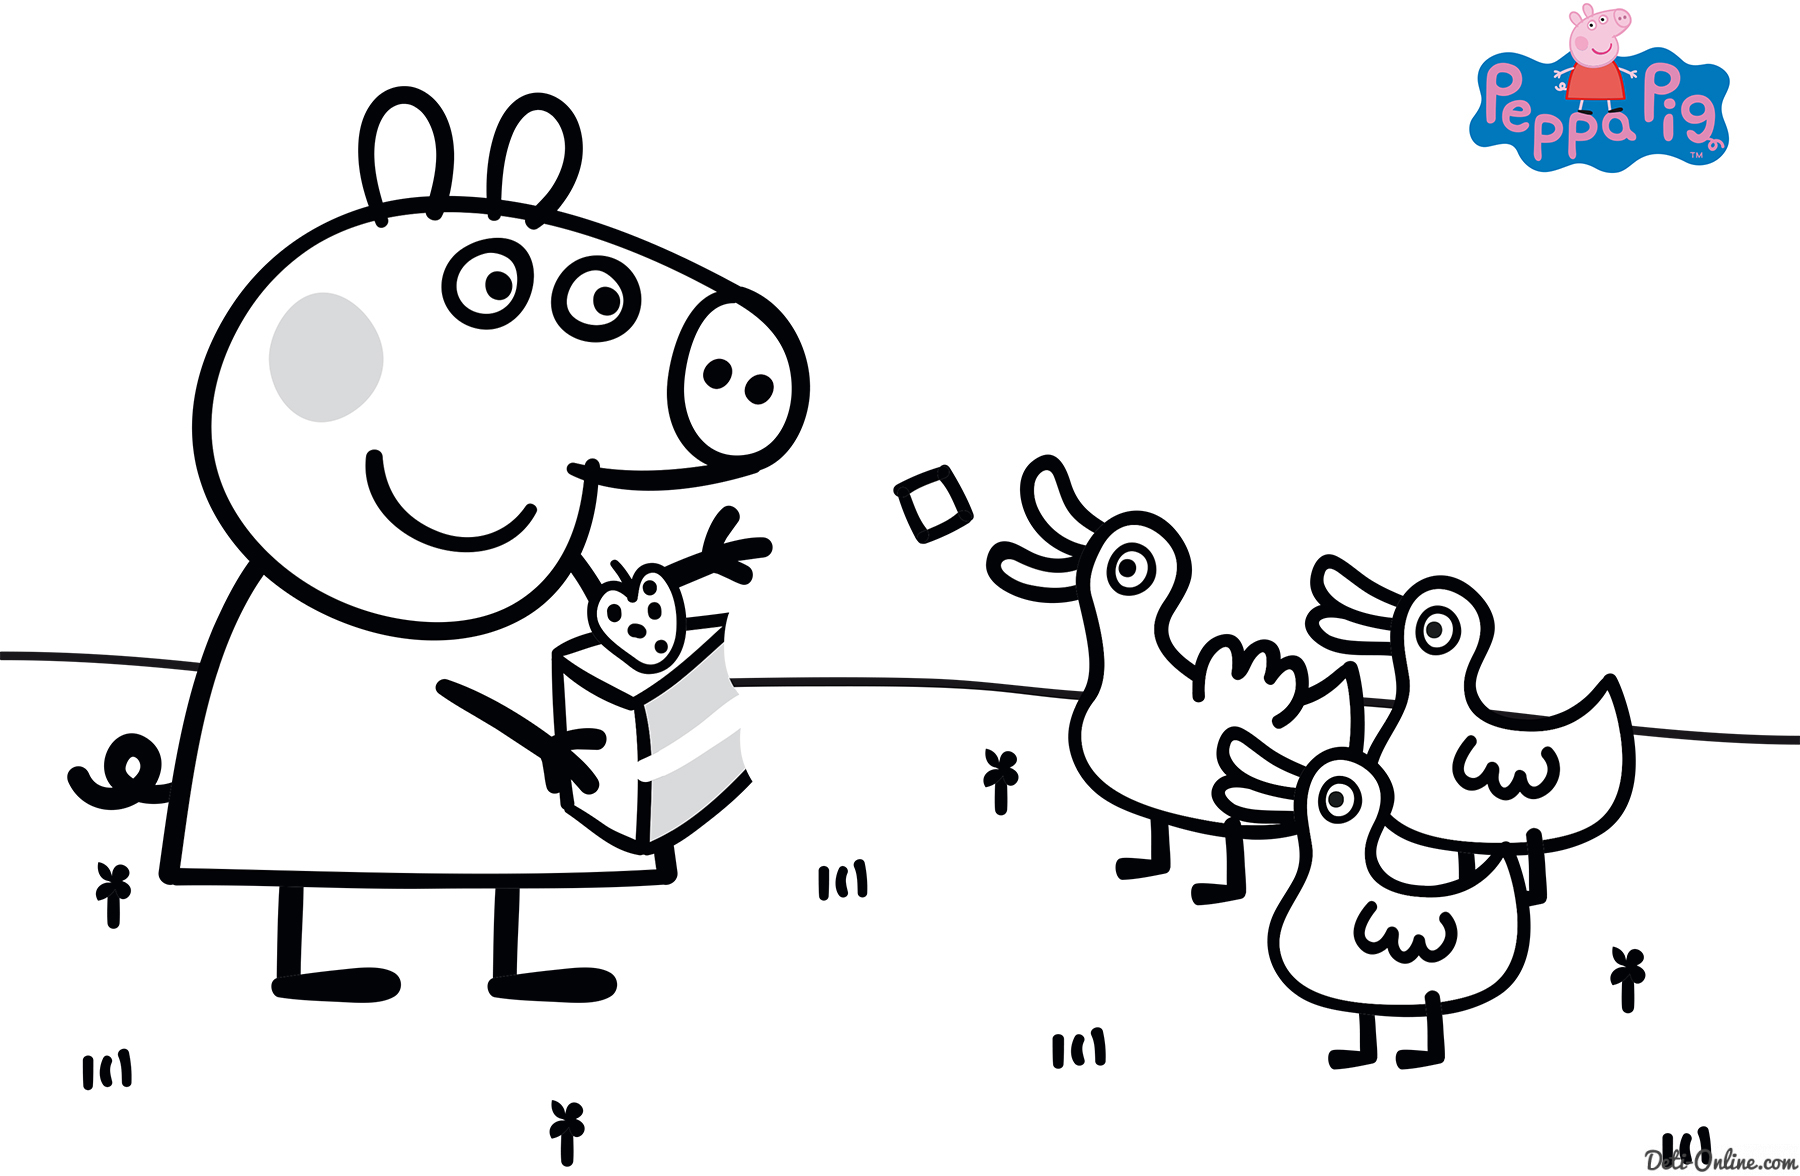 Peppa Pig Feeding Ducks Coloring Page